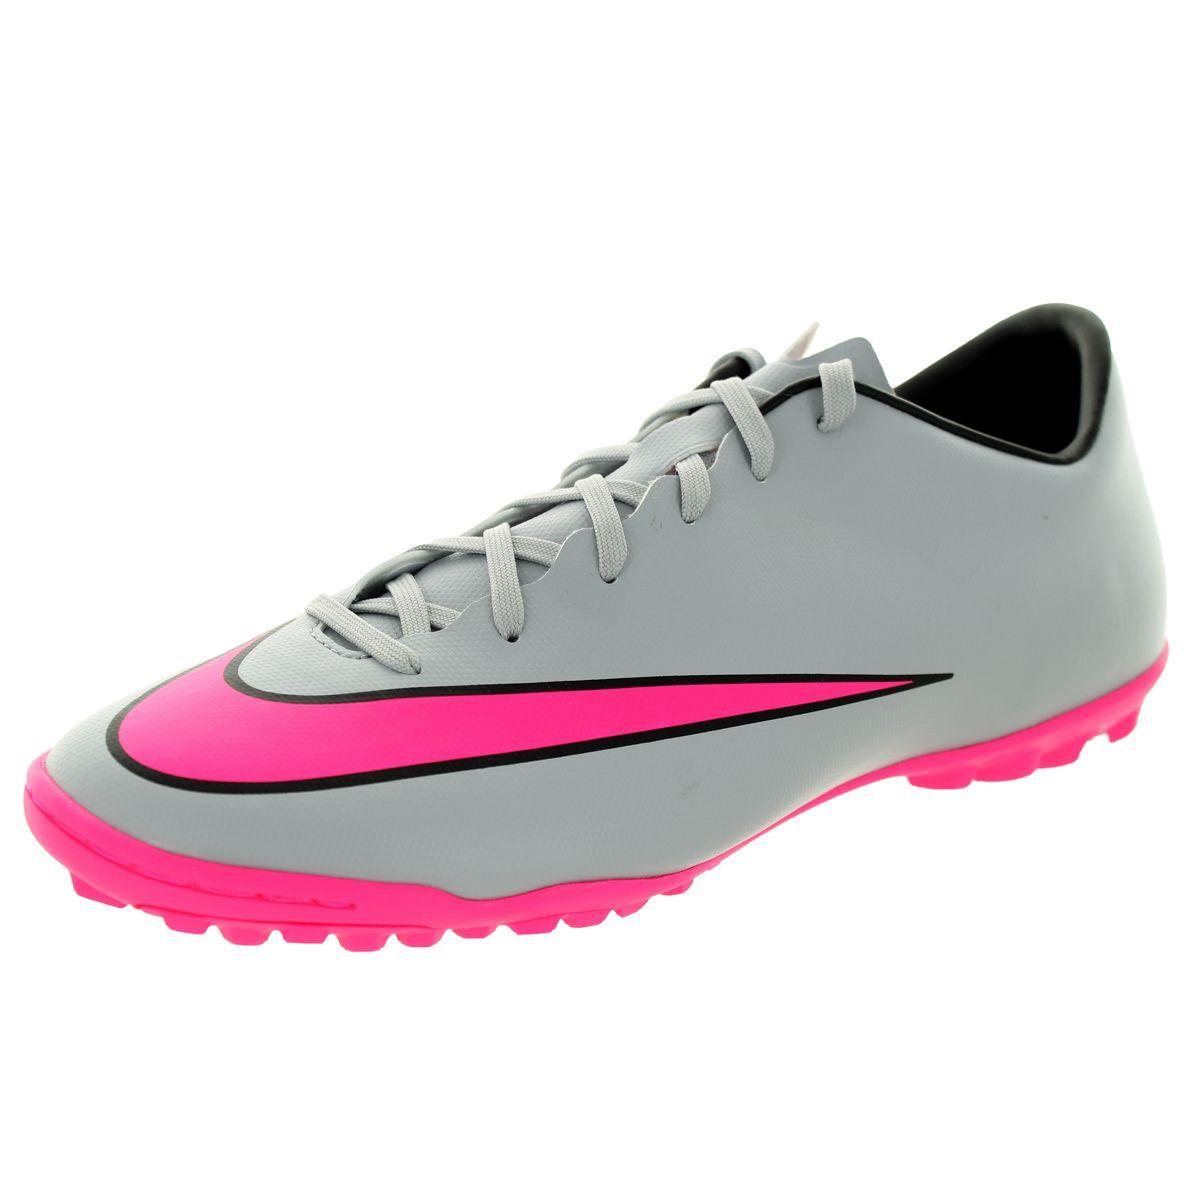 Nike Men's Mercurial Victory V Tf Wolf /Hyper Pink/Black/Black Turf Soccer